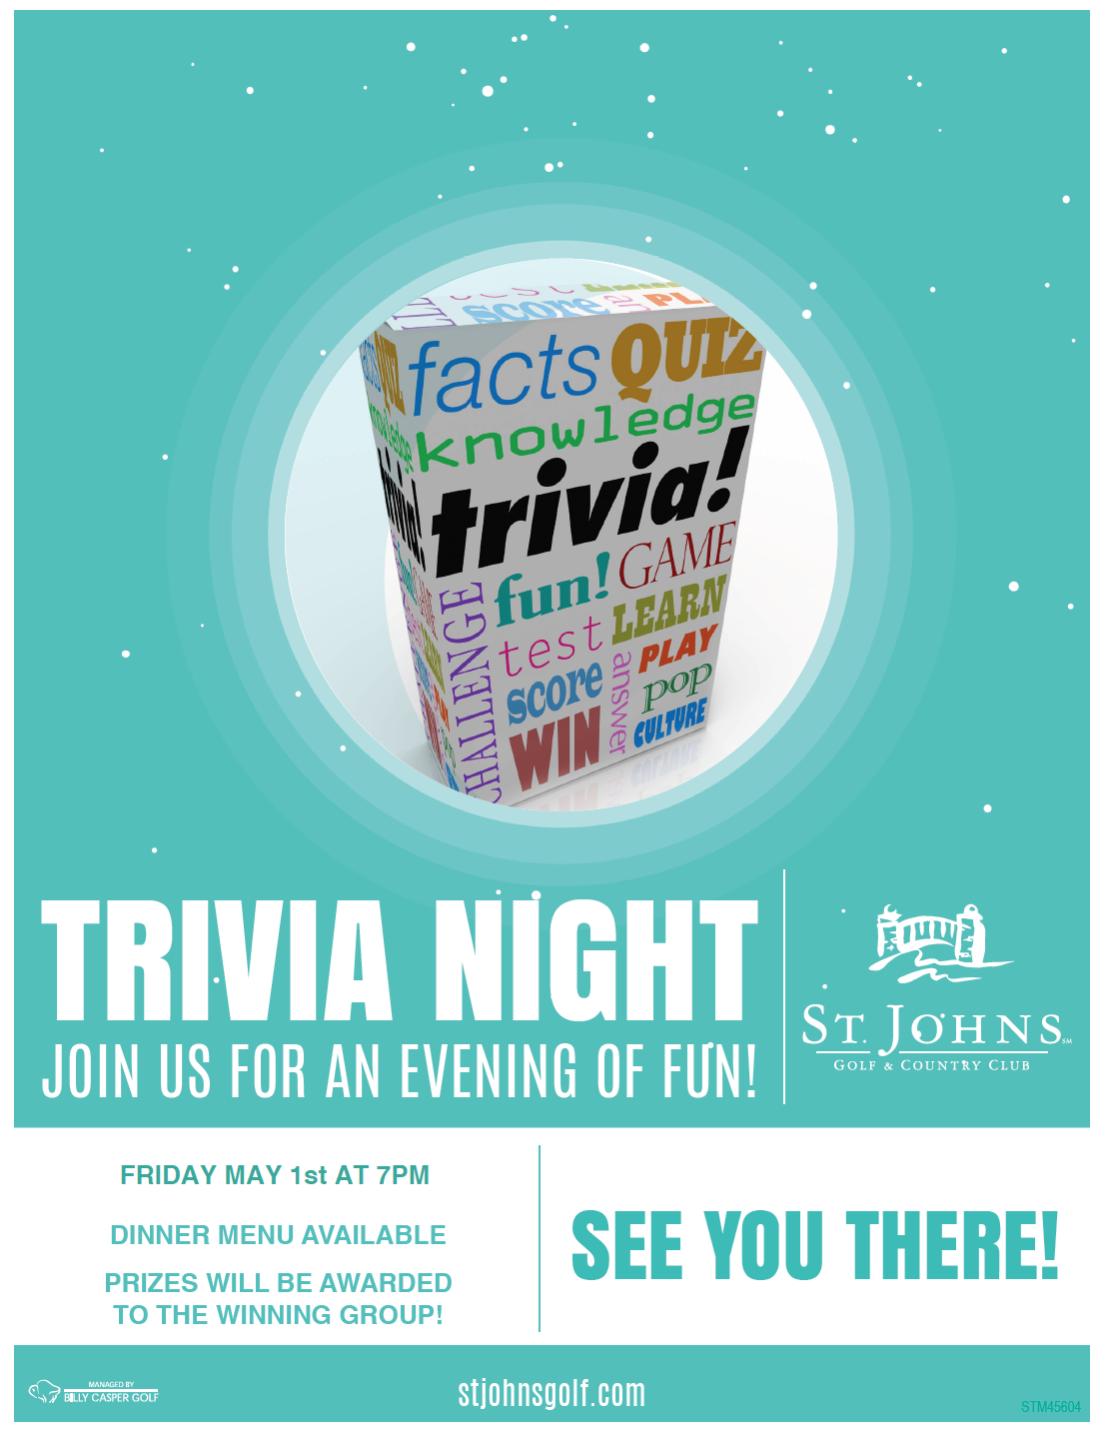 Trivia Night 5/1/15 St. Johns Golf & Country Club St. Augustine, FL